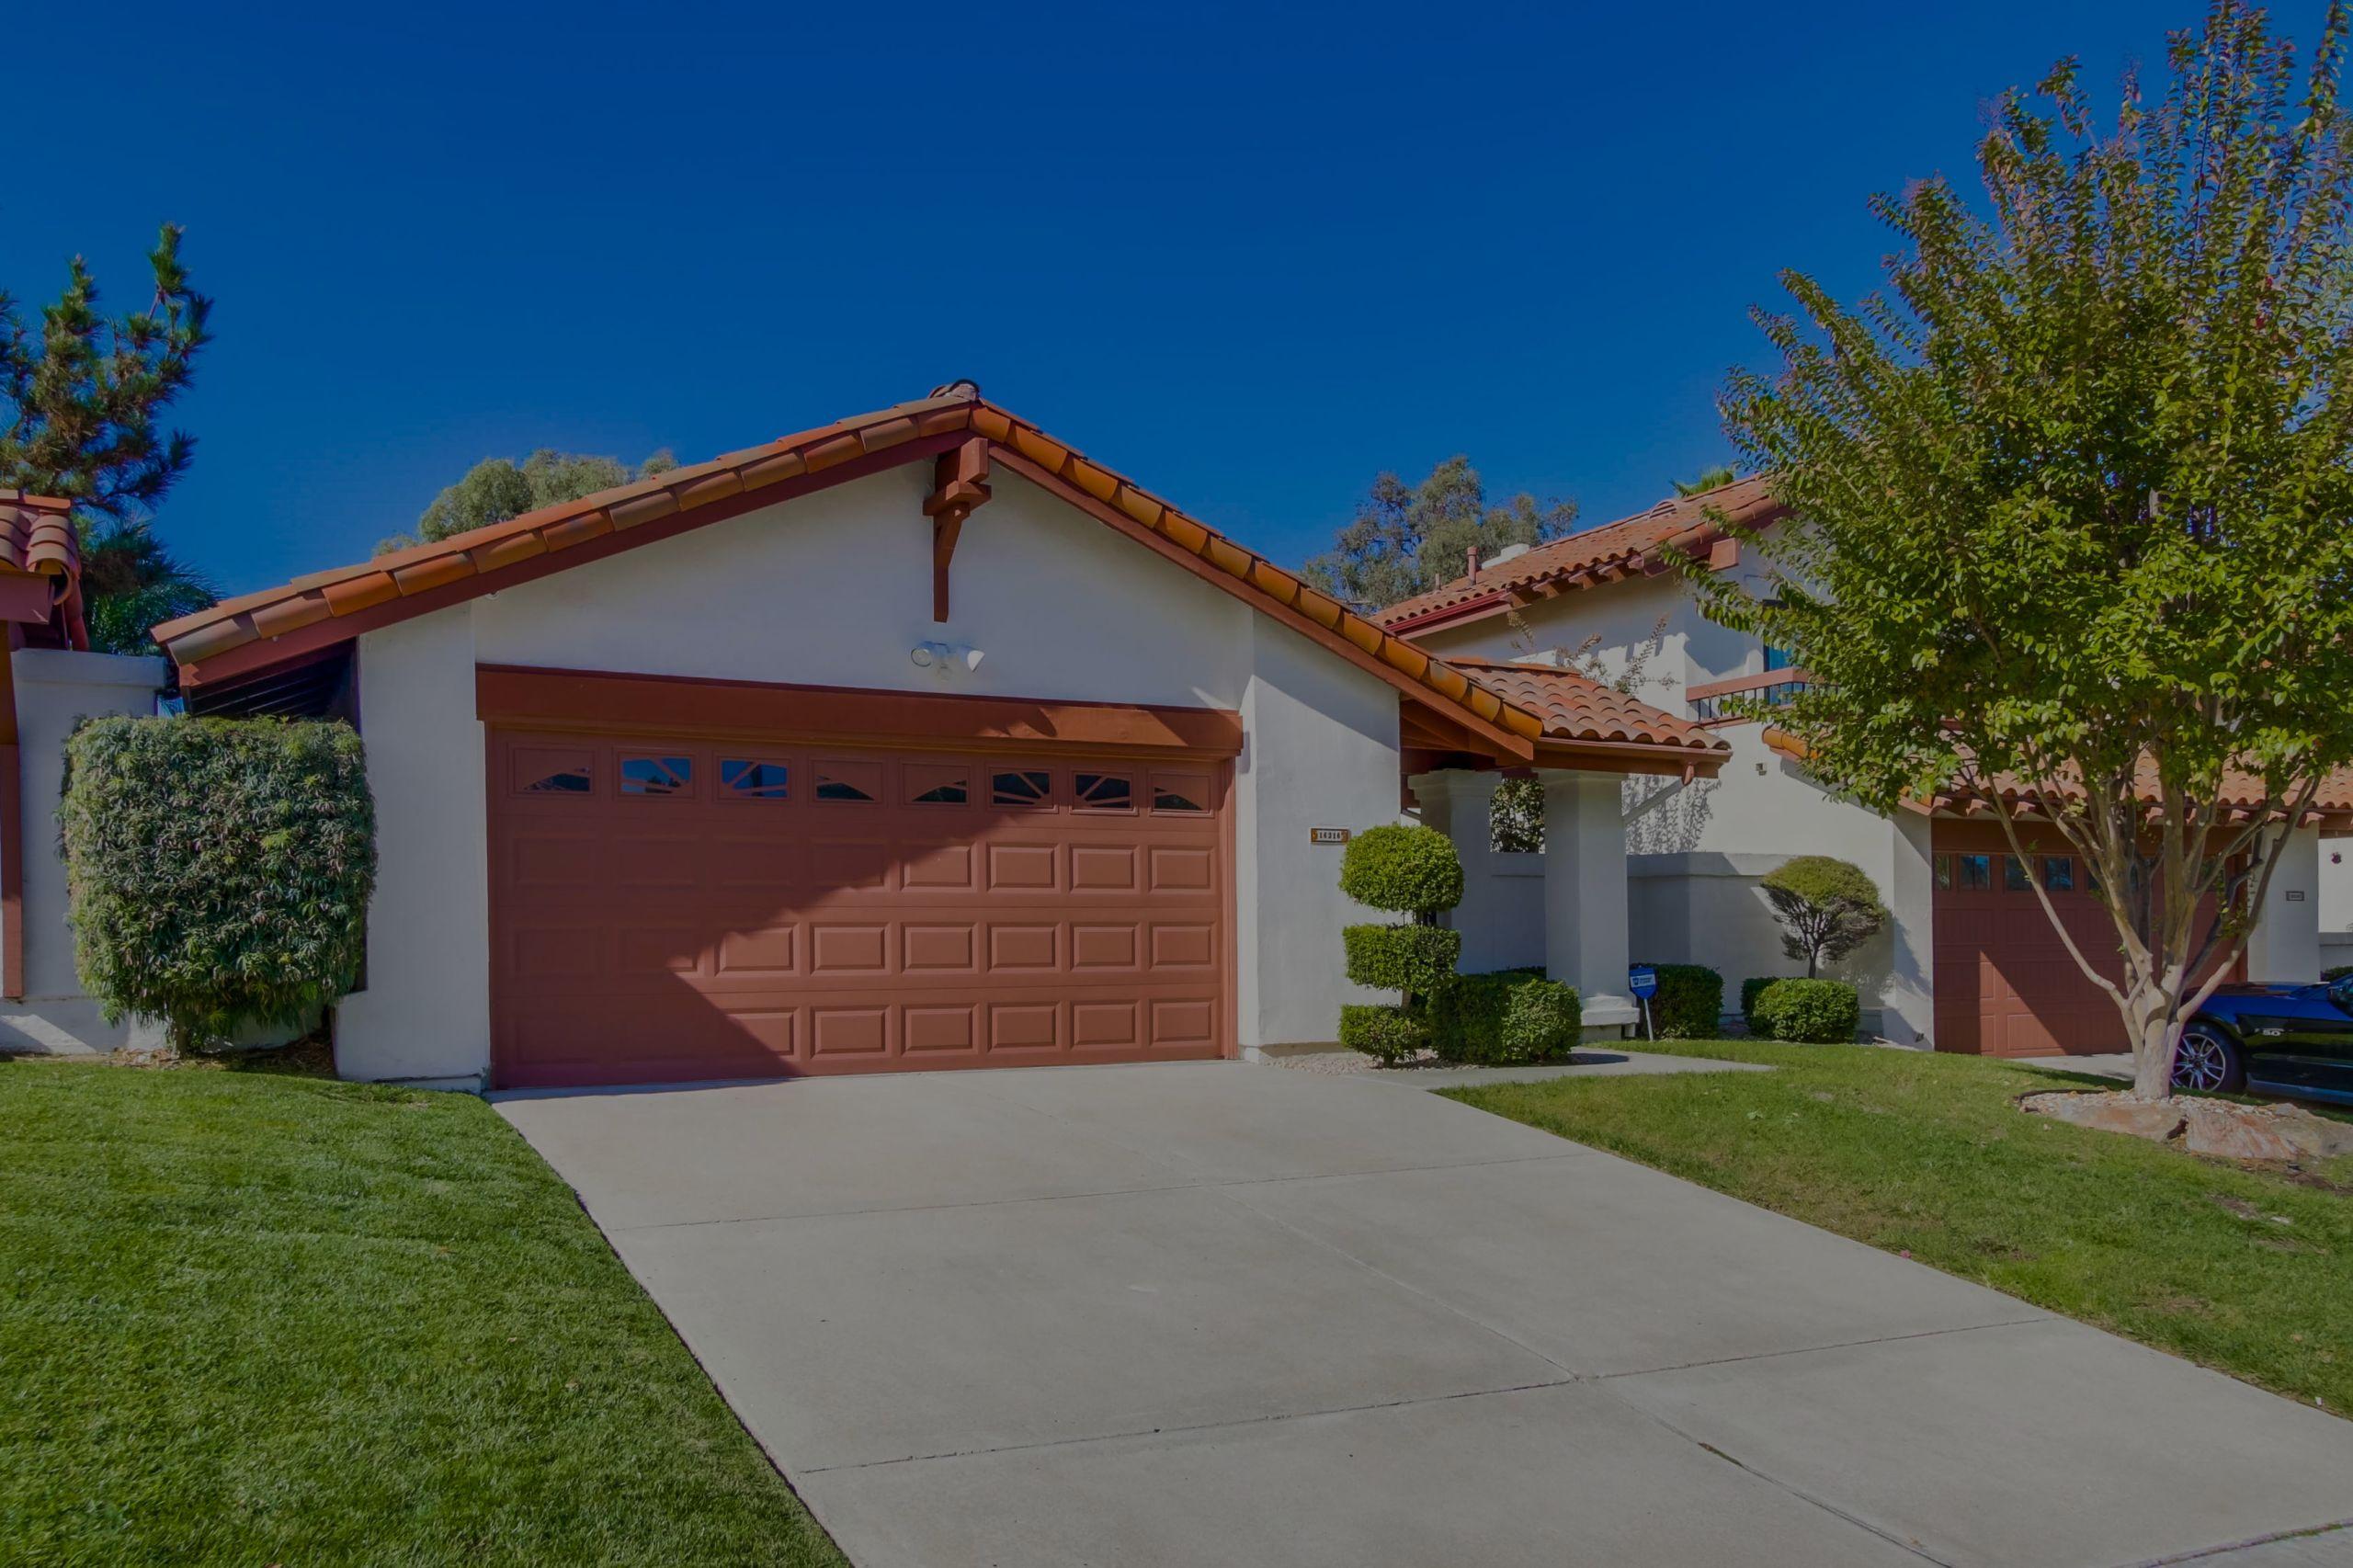 16316 Avenida Nobleza San Diego, CA 92128